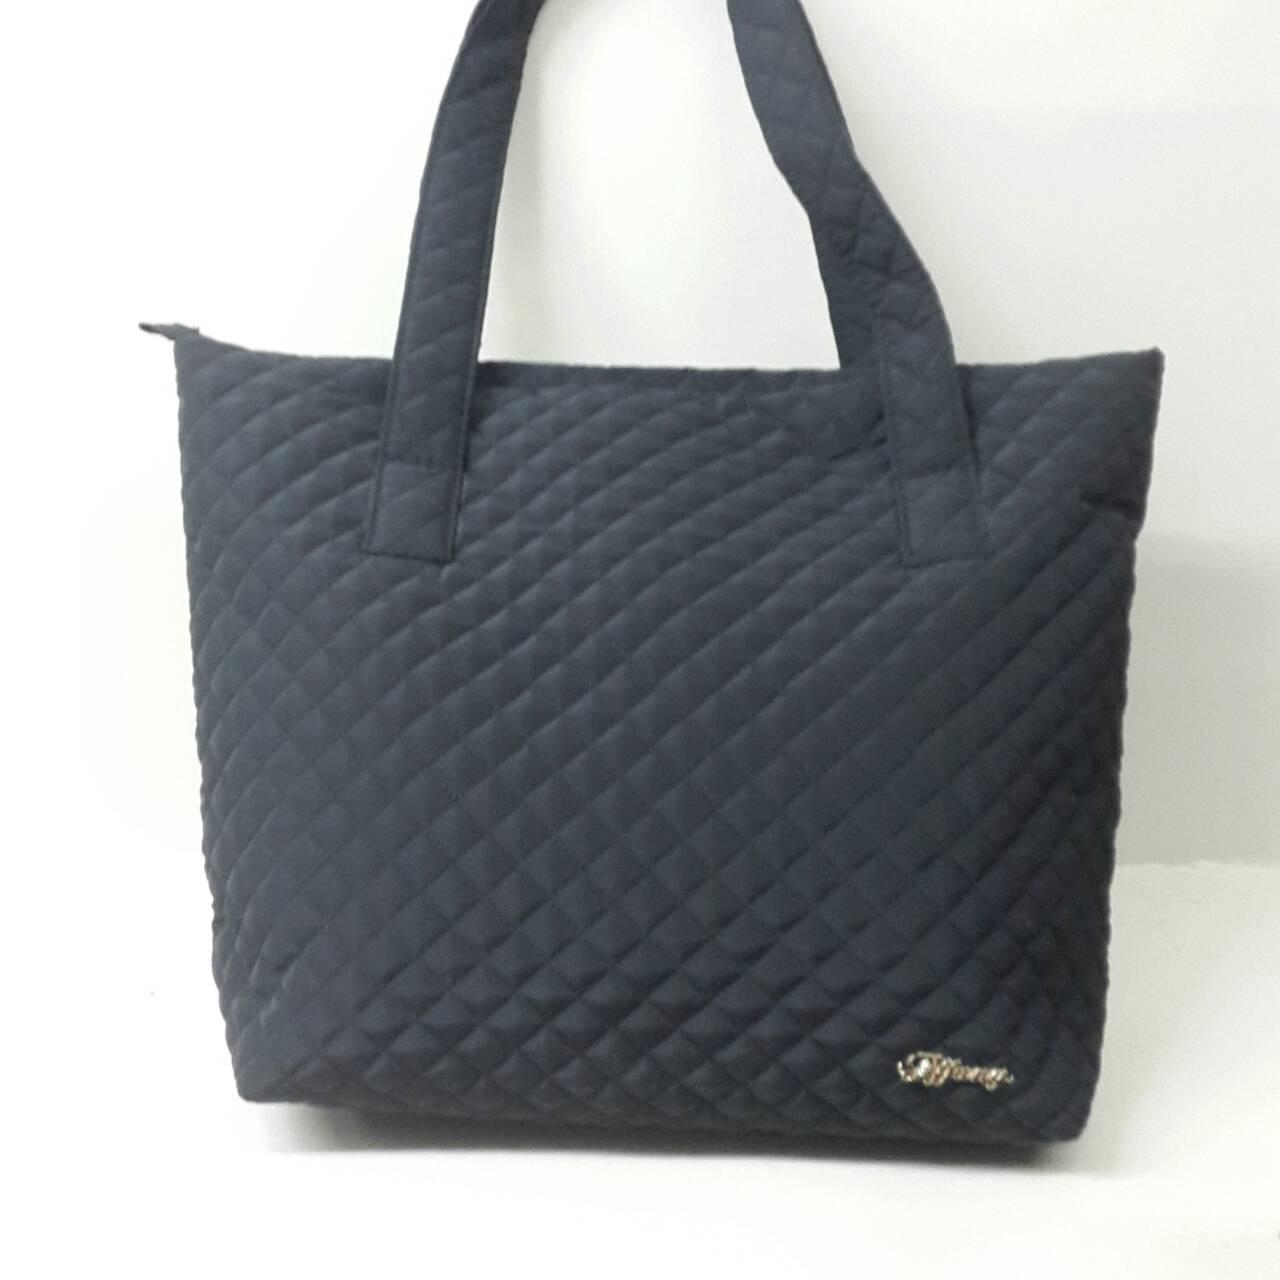 17af676b49fb Стёганая сумка : продажа, цена в Харькове. женские сумочки и клатчи ...